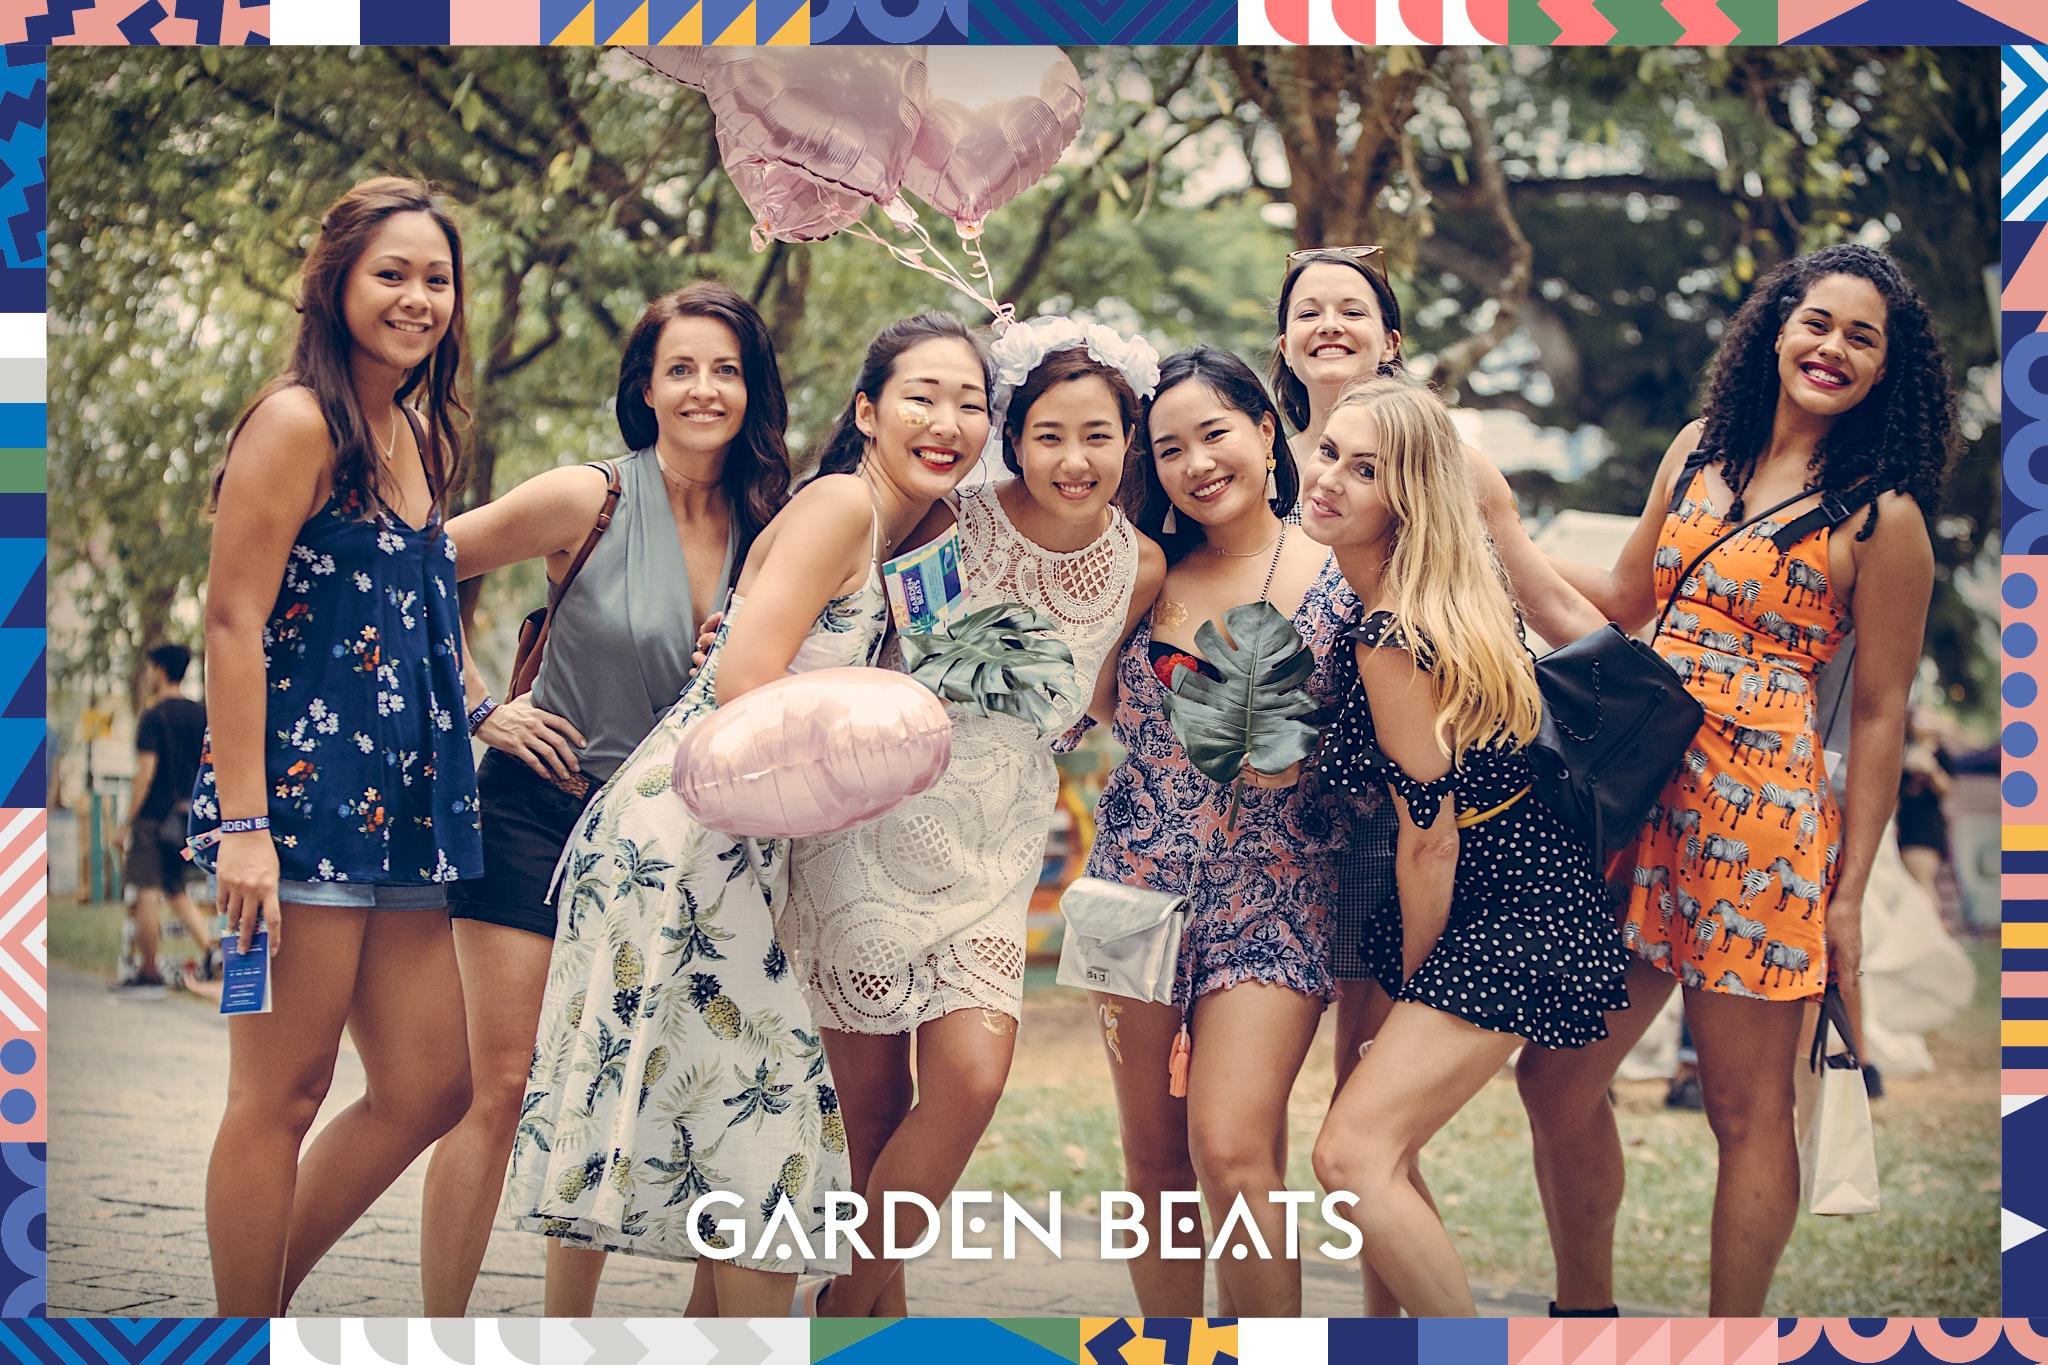 03032018_GardenBeats_Colossal435_Watermarked.jpg